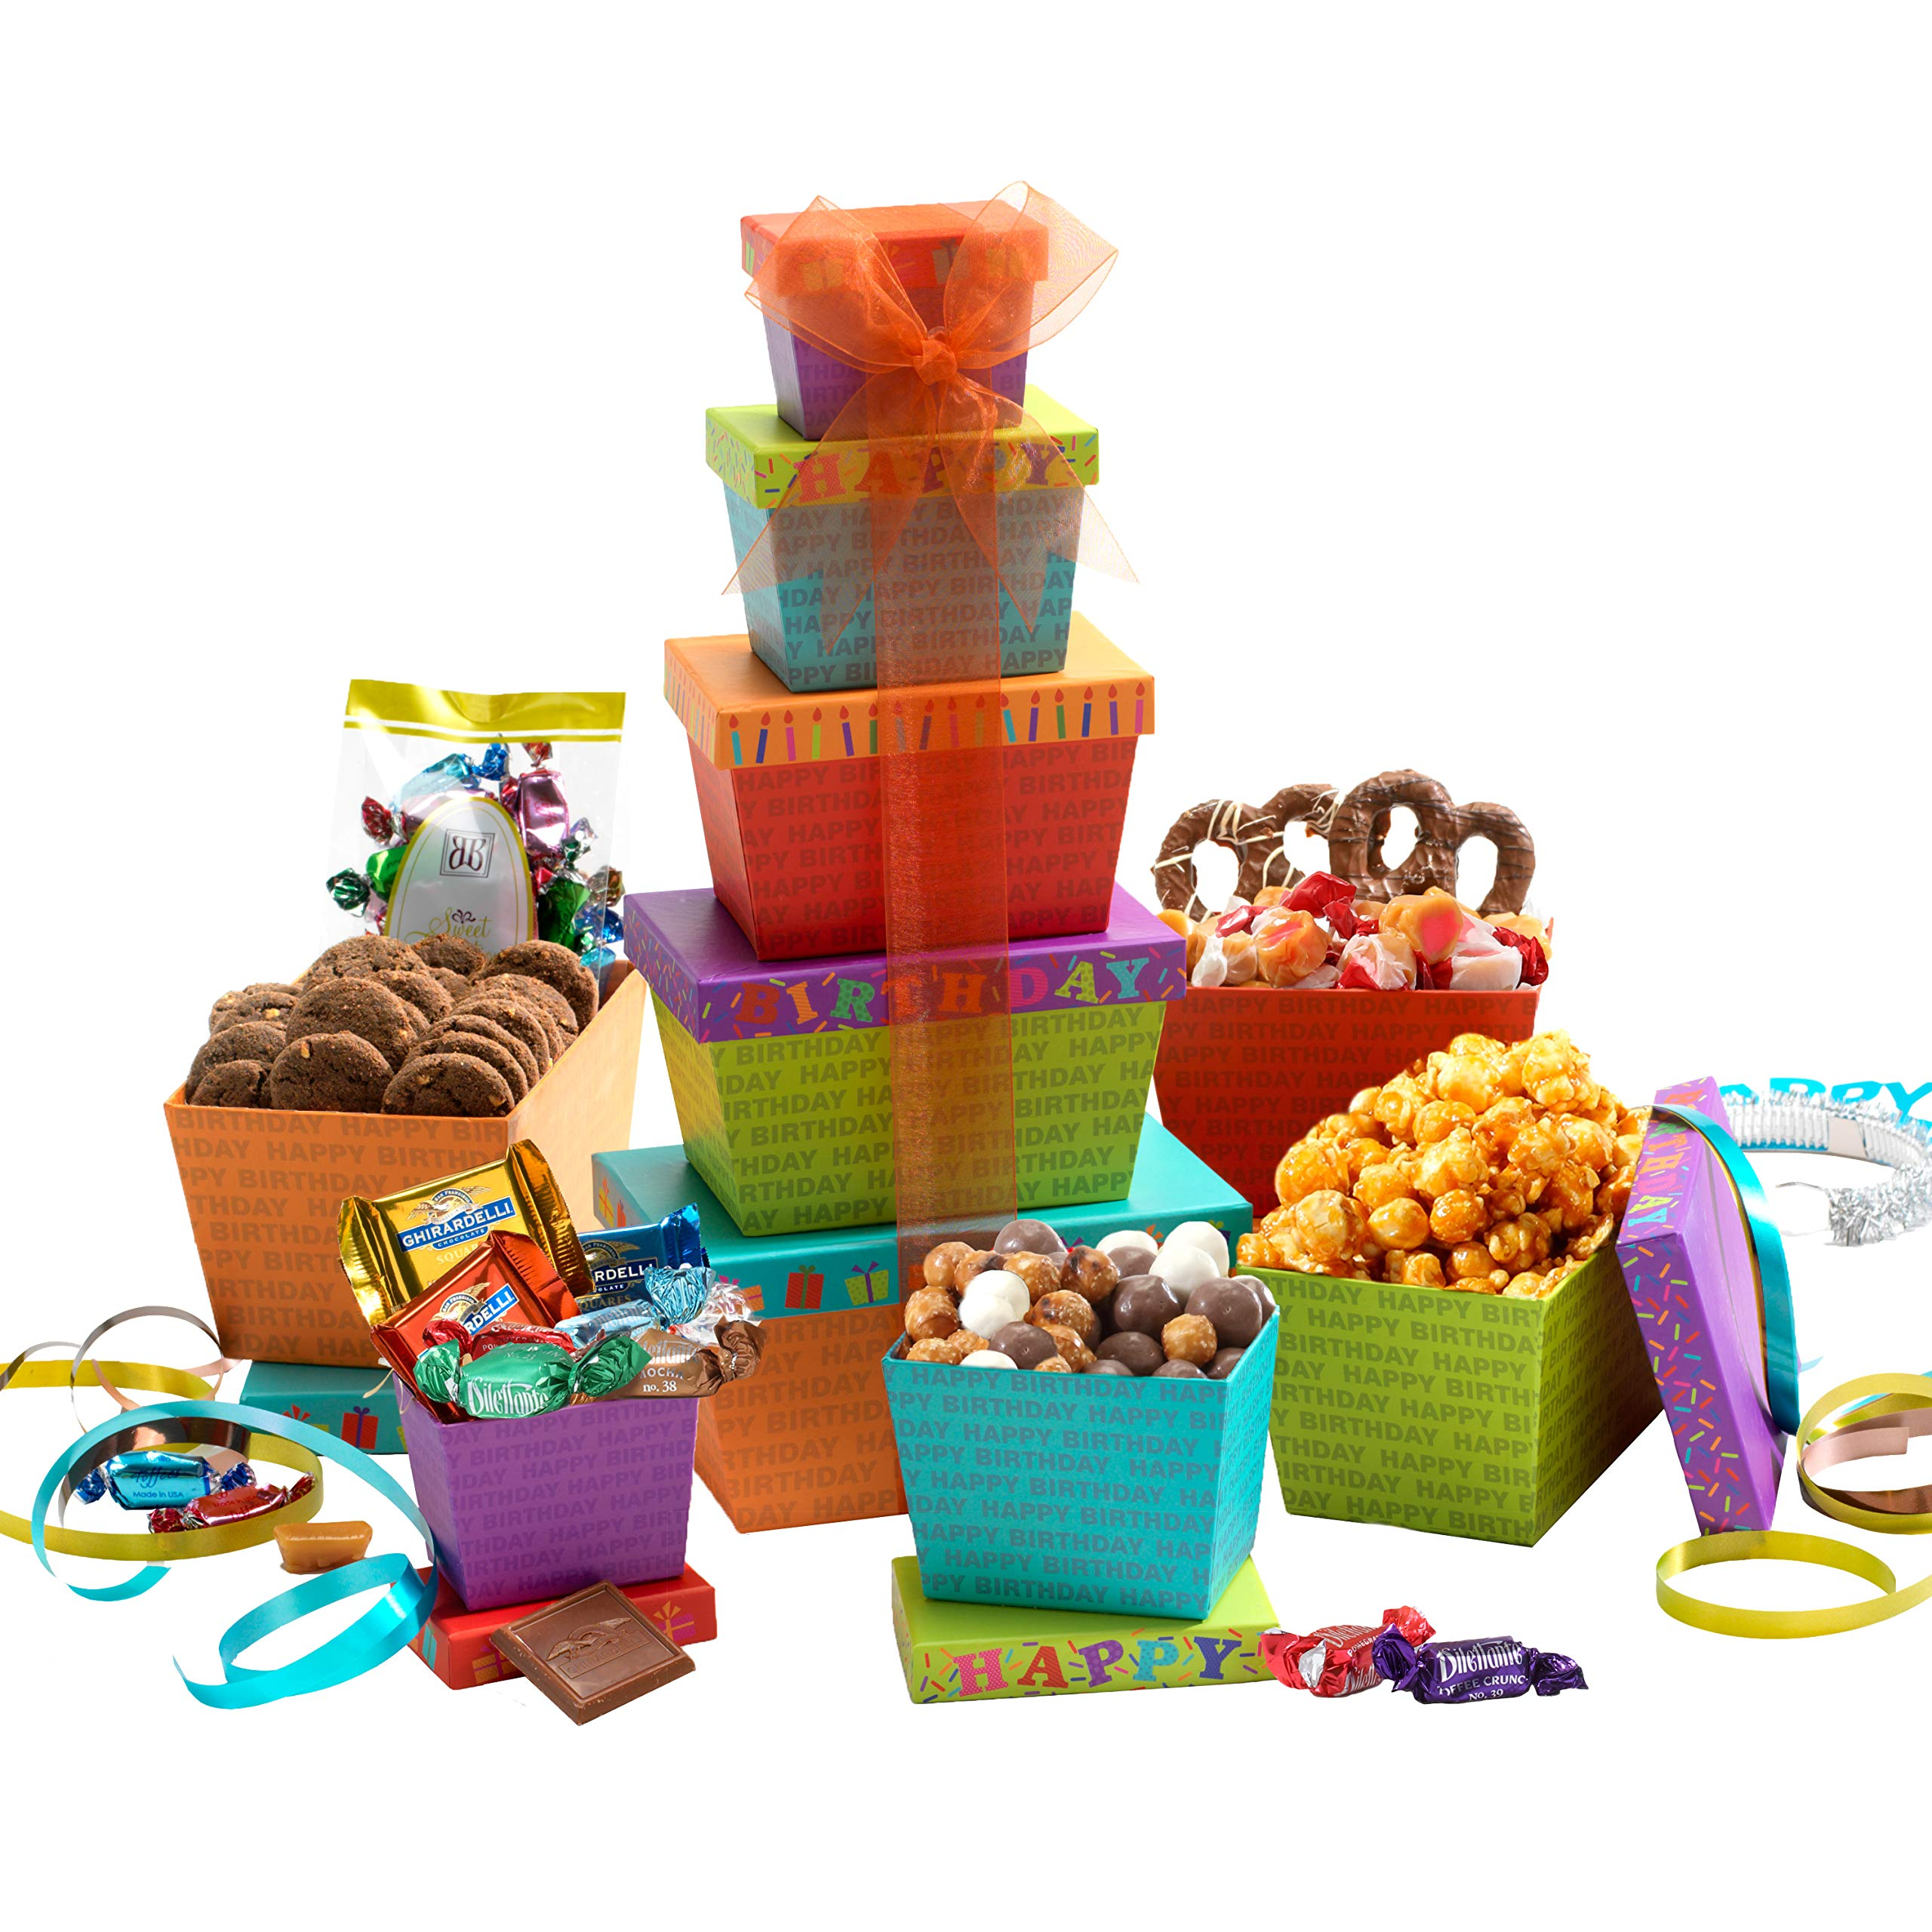 Amazon Broadway Basketeers Gift Tower Happy Birthday Celebration Grocery Gourmet Food